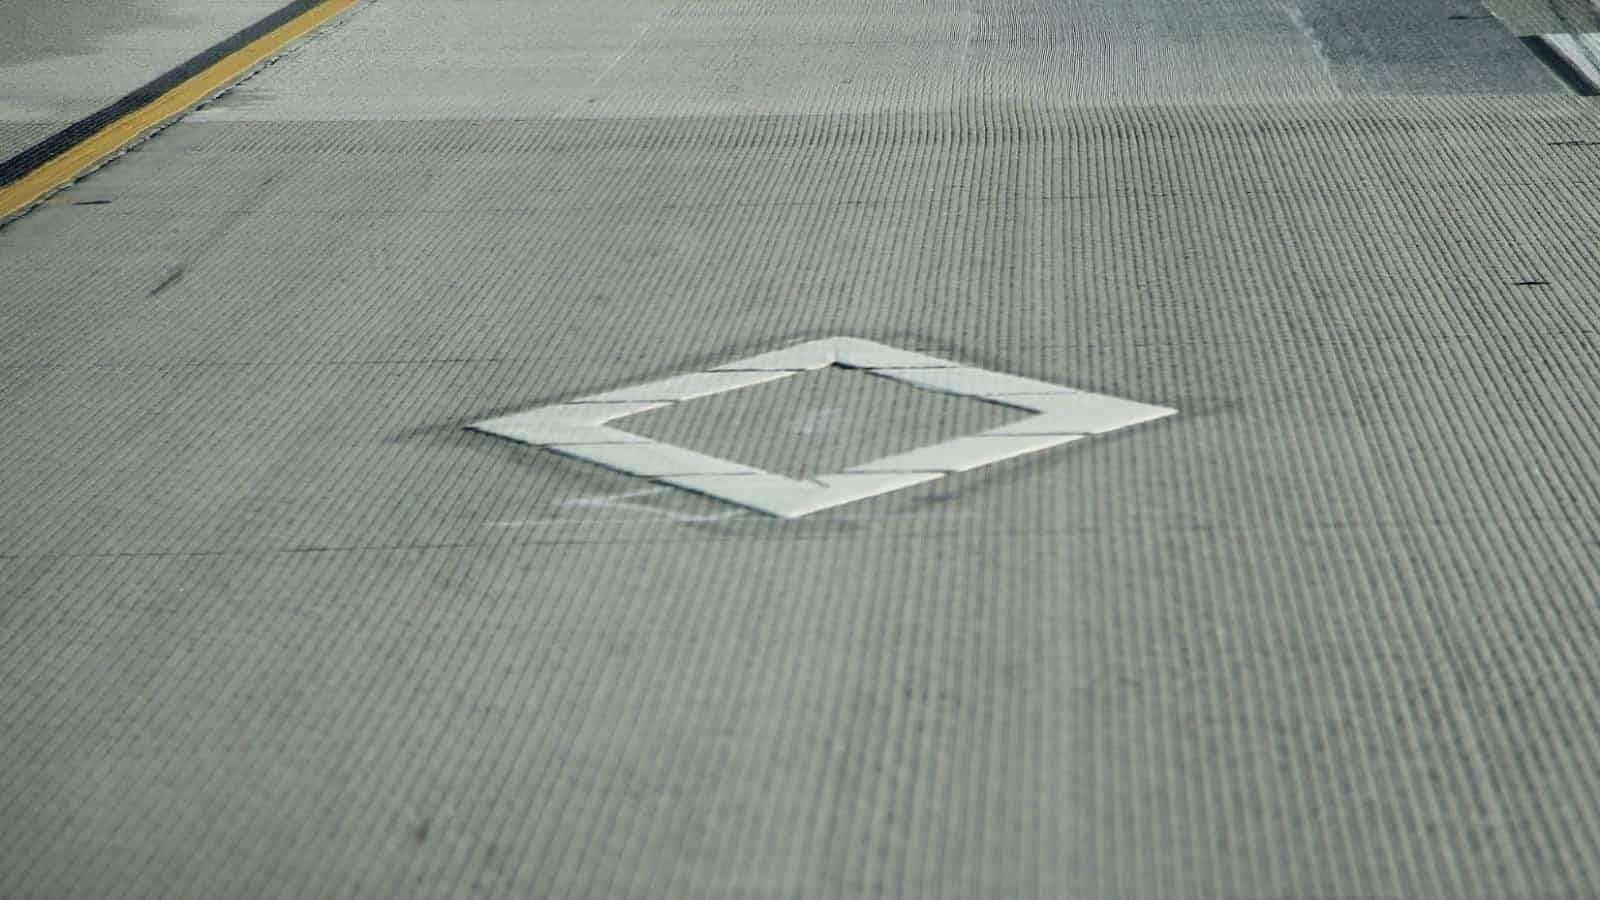 HOV lane diamond symbol road marking